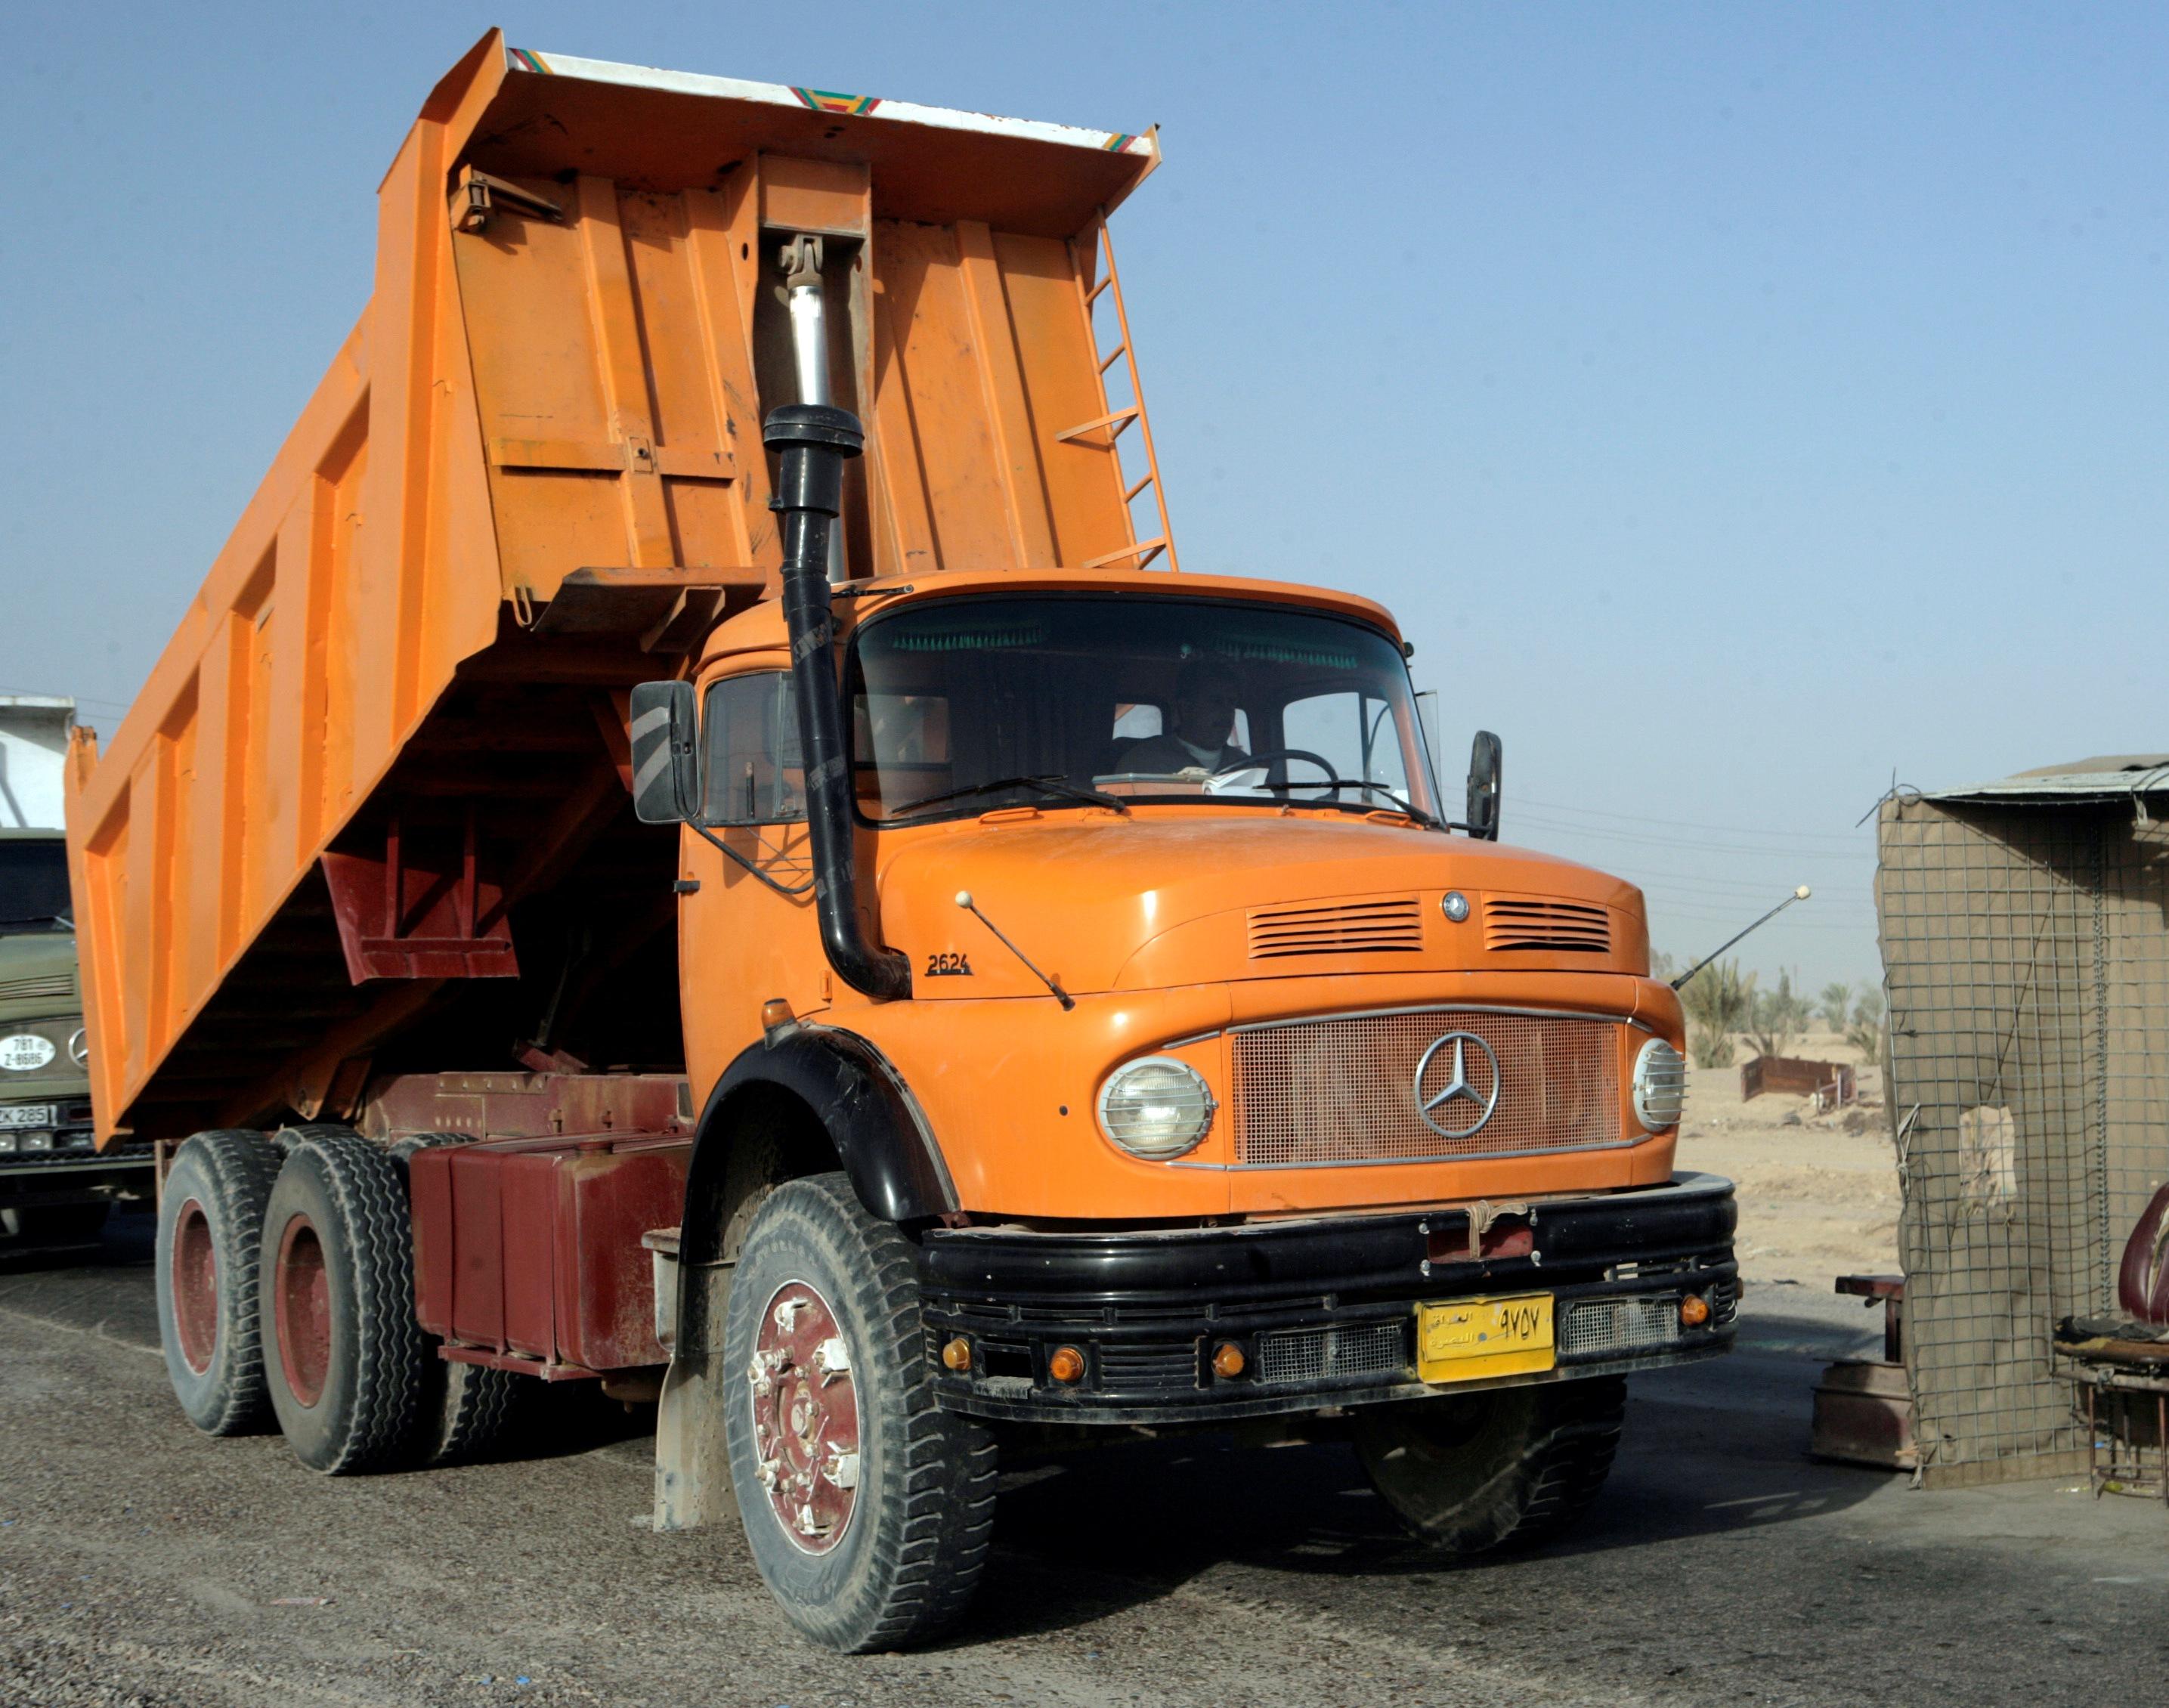 File:Mercedes-Benz 2624 in Iraq.jpg